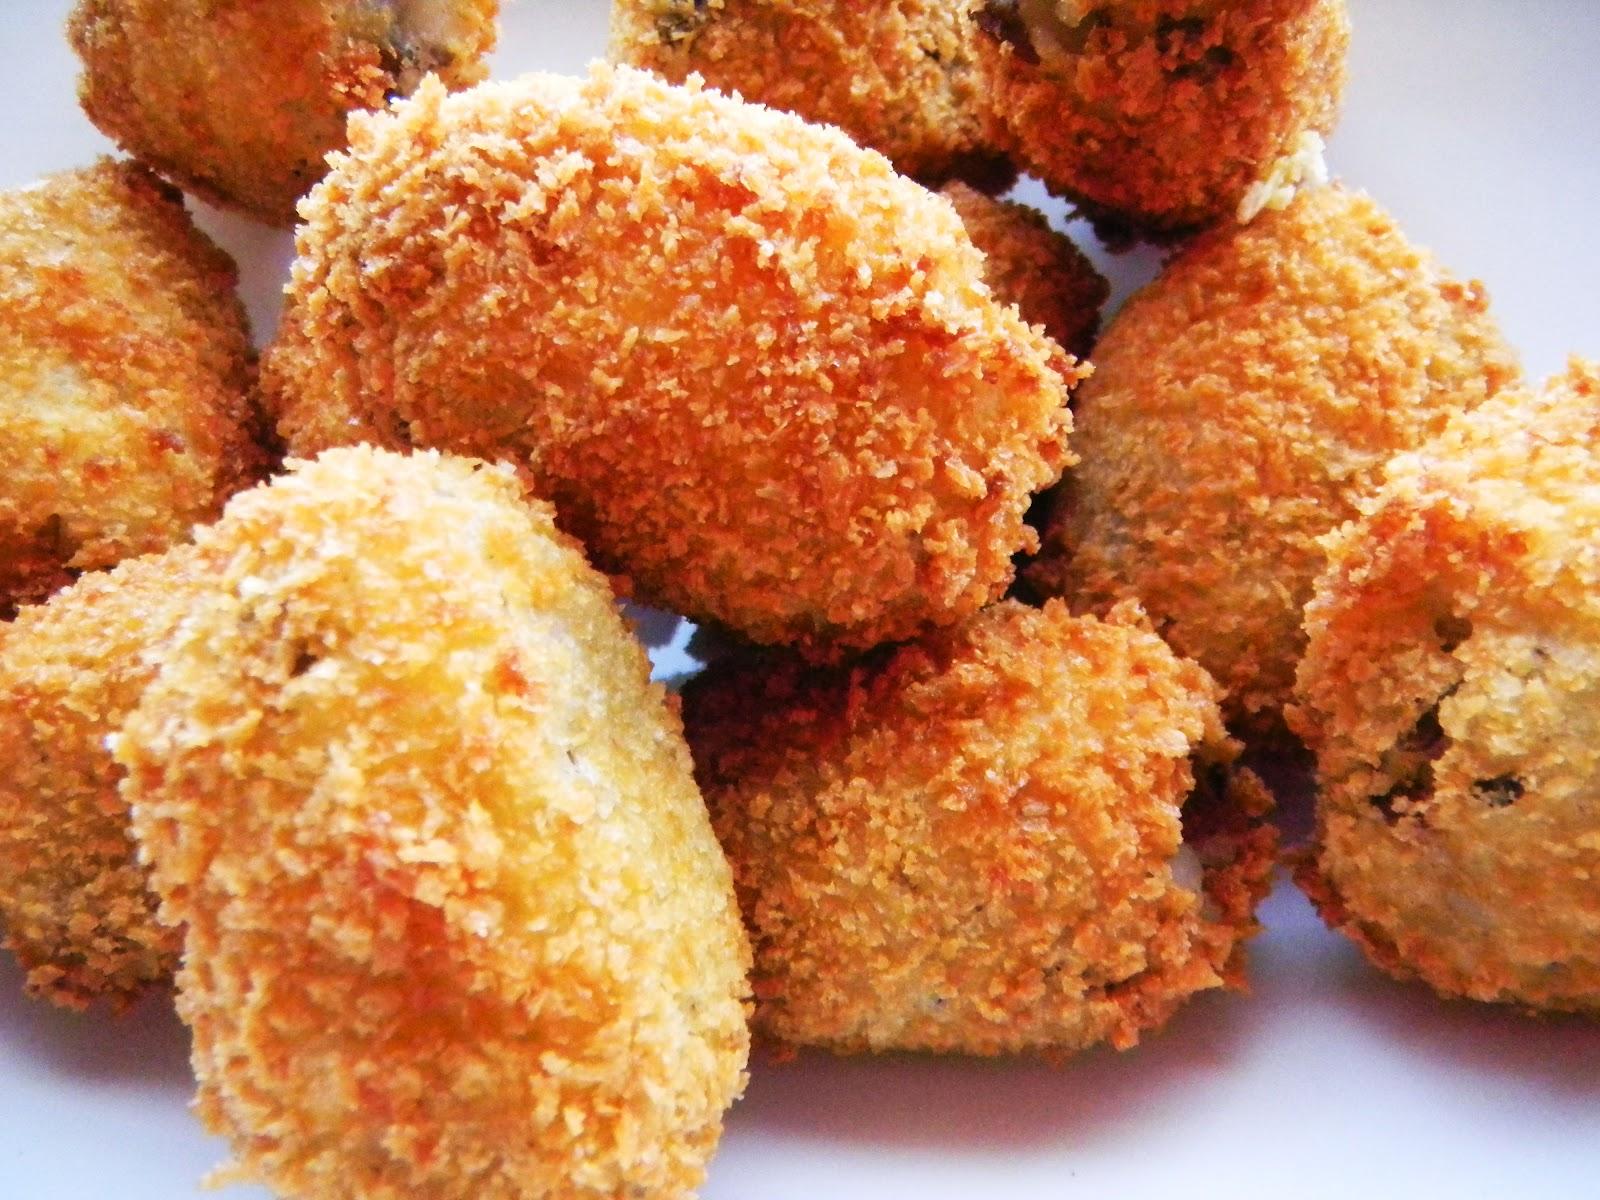 Potato Croquettes - Cherry on my Sundae